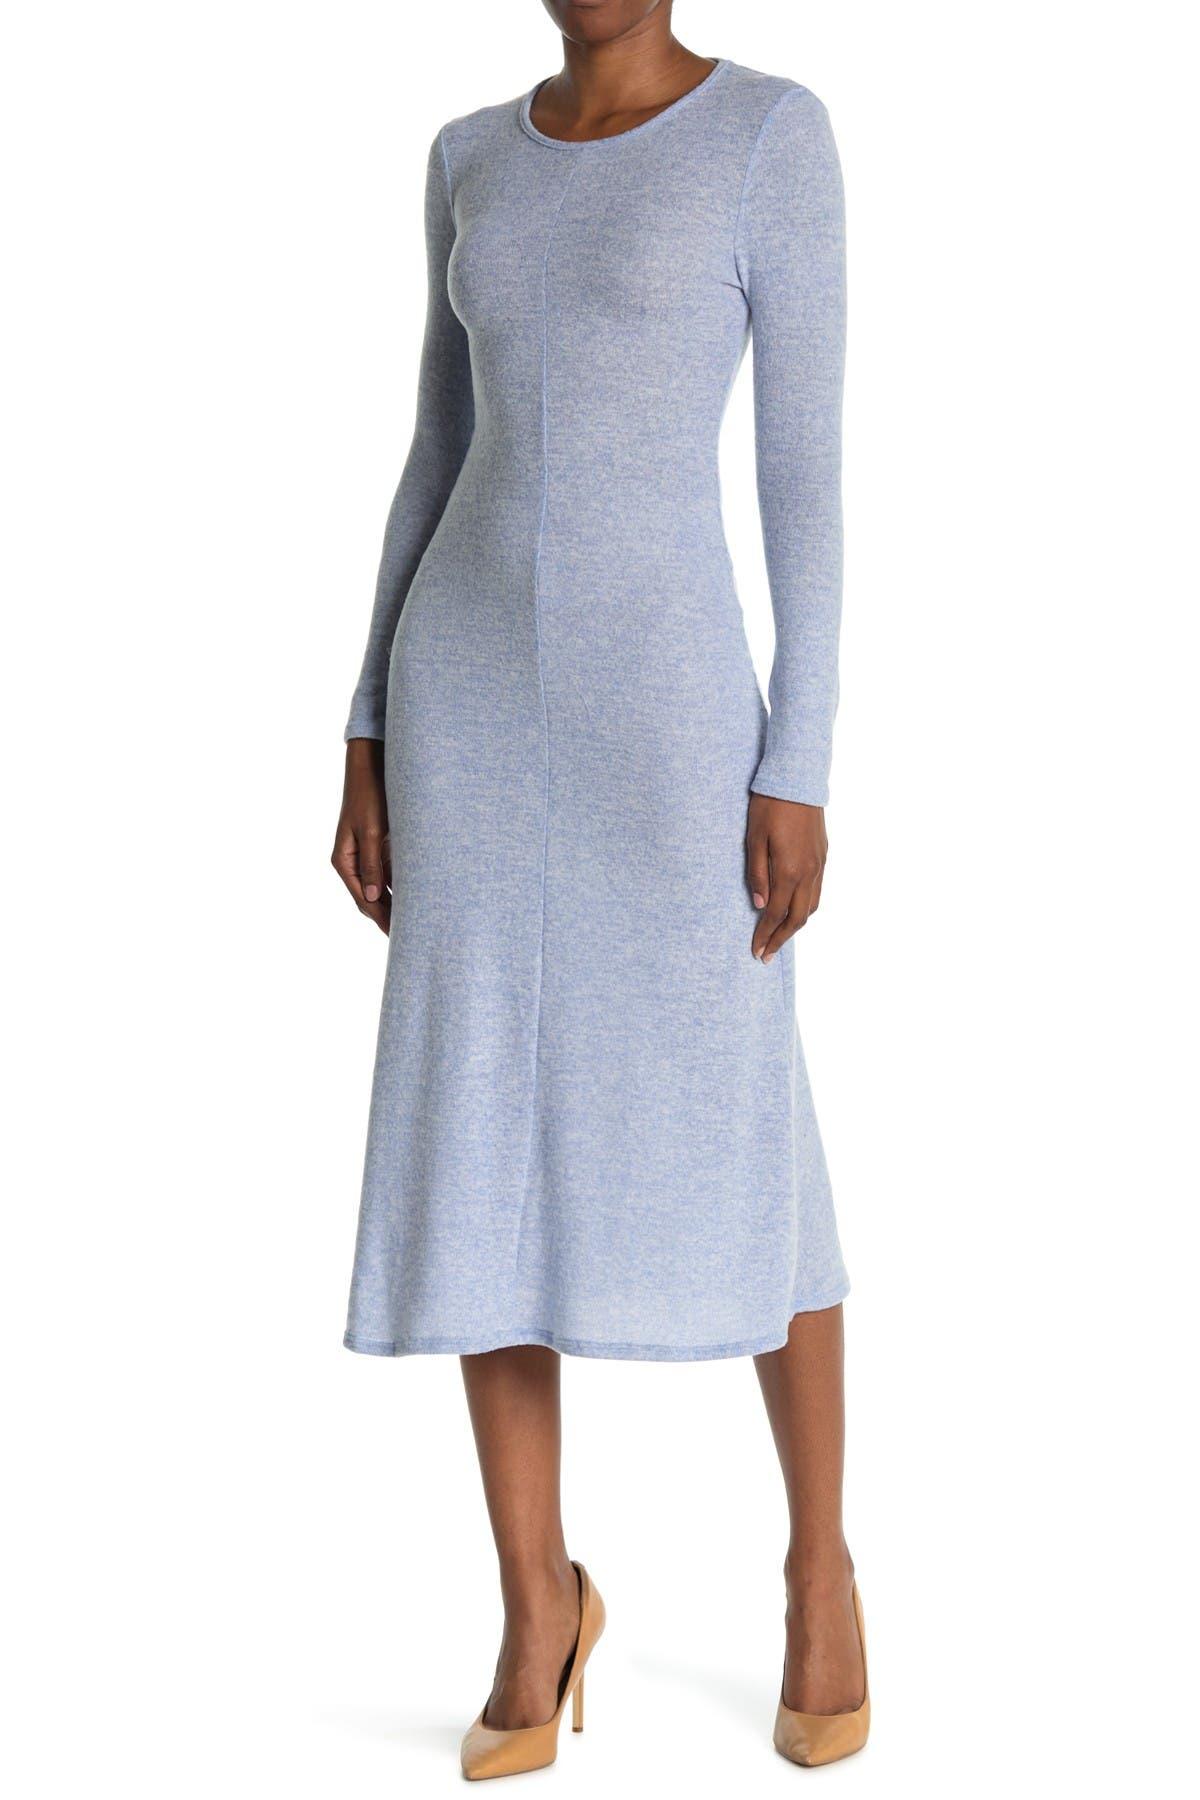 Image of Velvet Torch Long Sleeve Crew Neck Maxi Dress